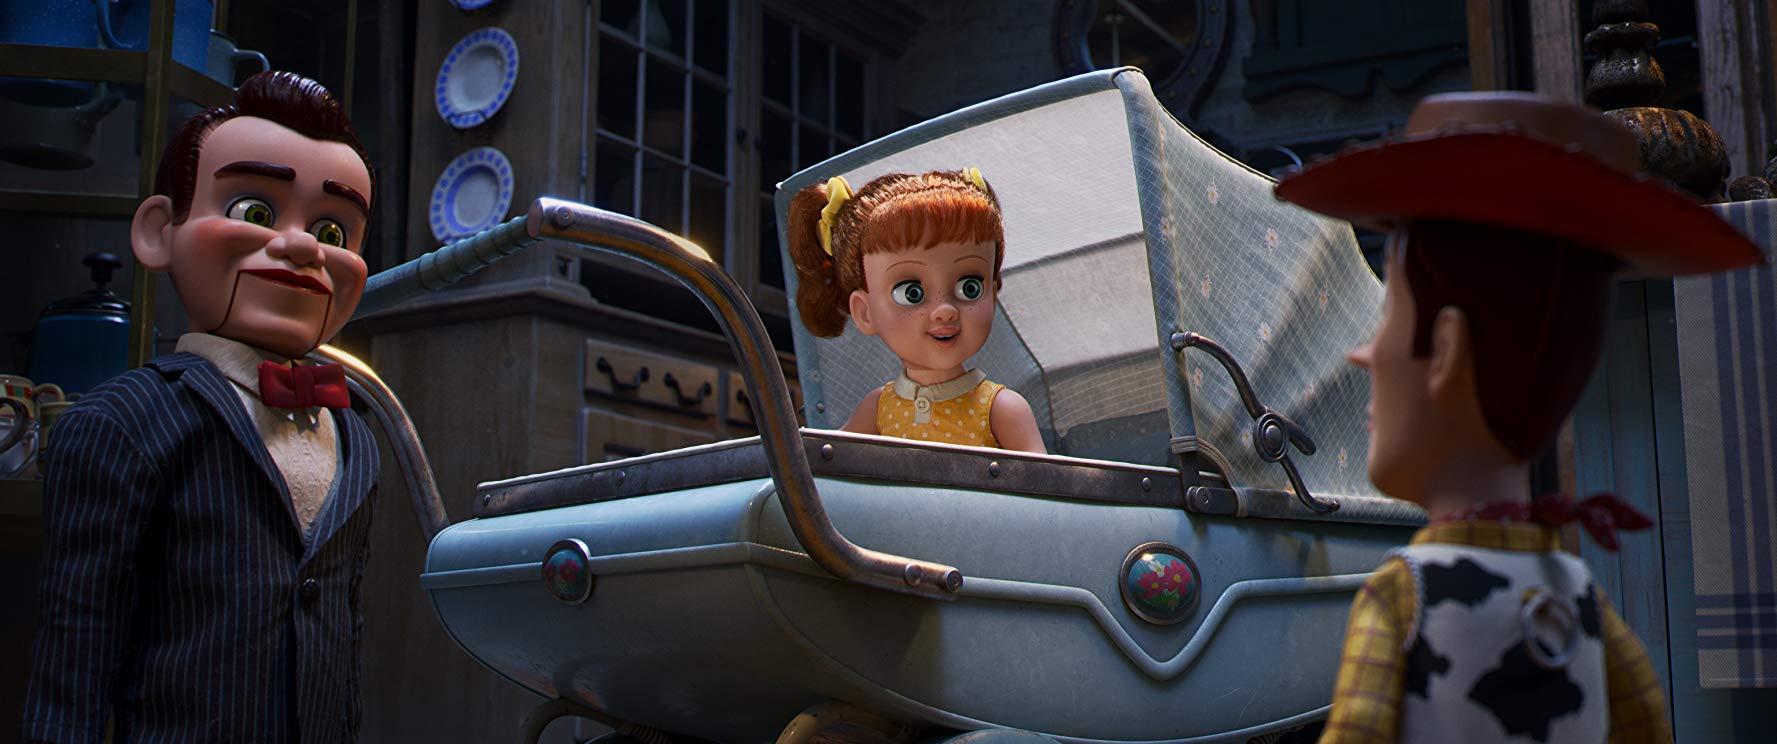 Toy-Story-4d.jpg